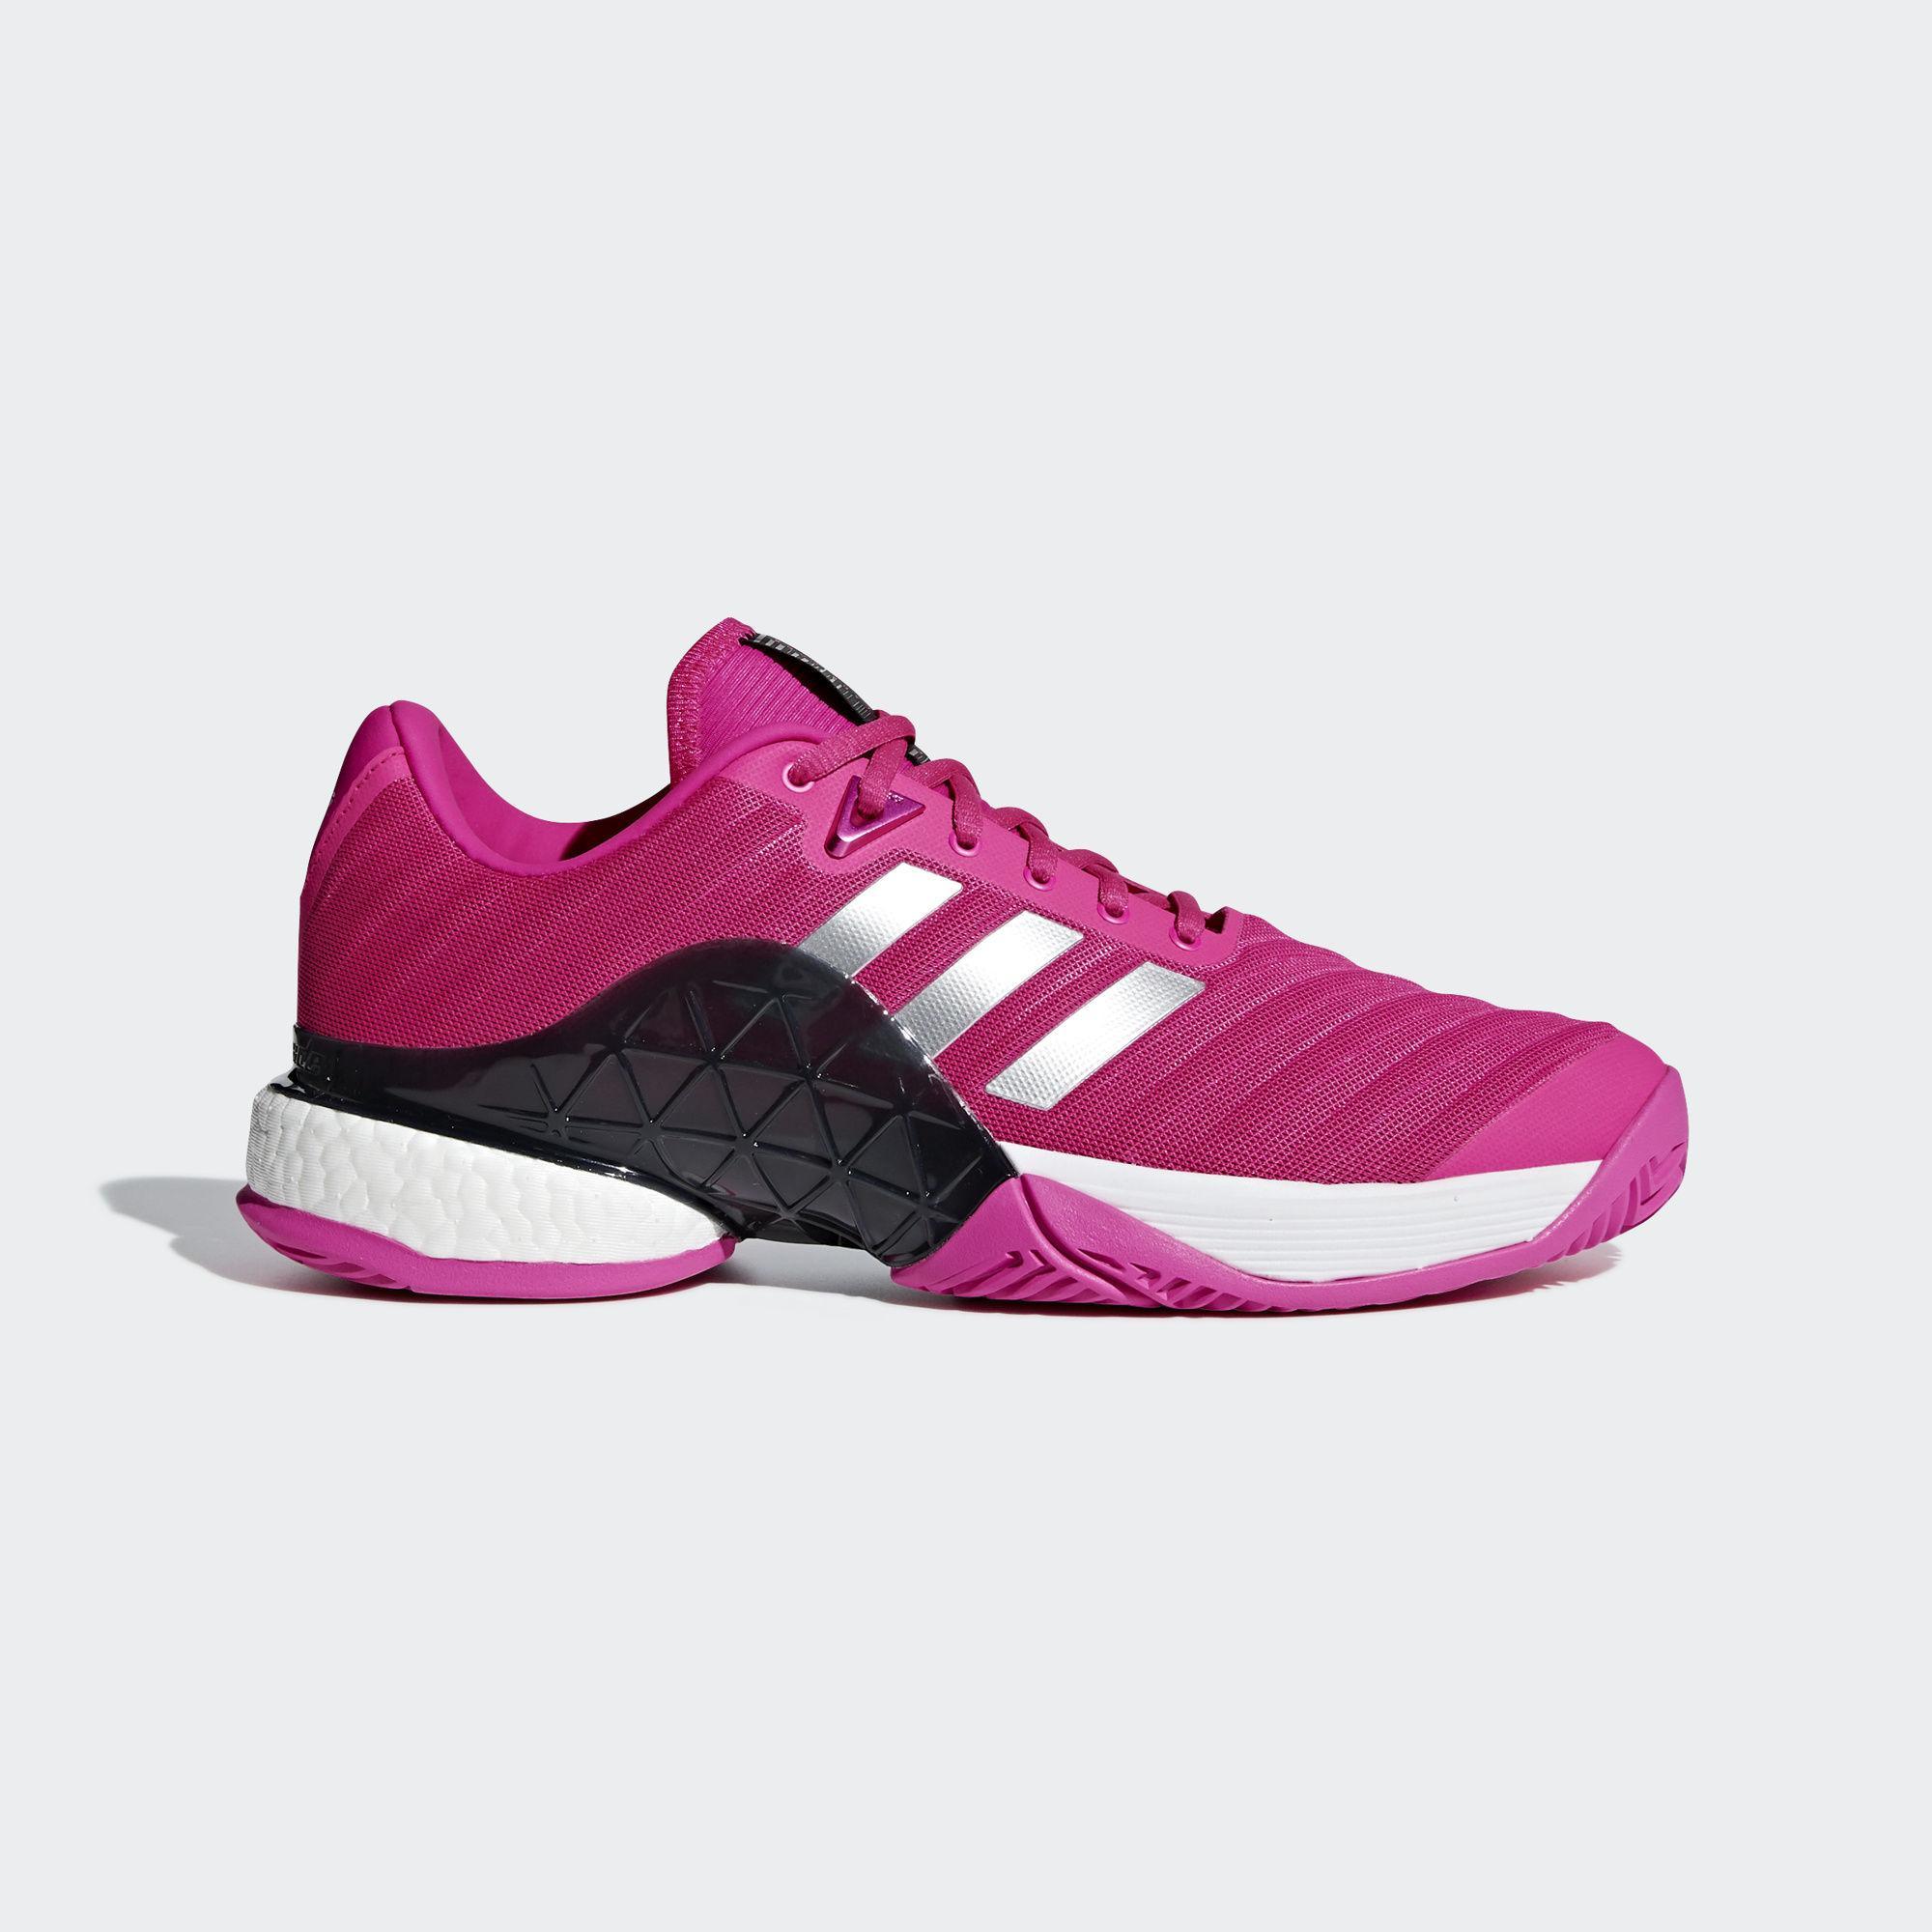 Adidas Mens Barricade Boost 2018 Tennis Shoes - Shock Pink ...